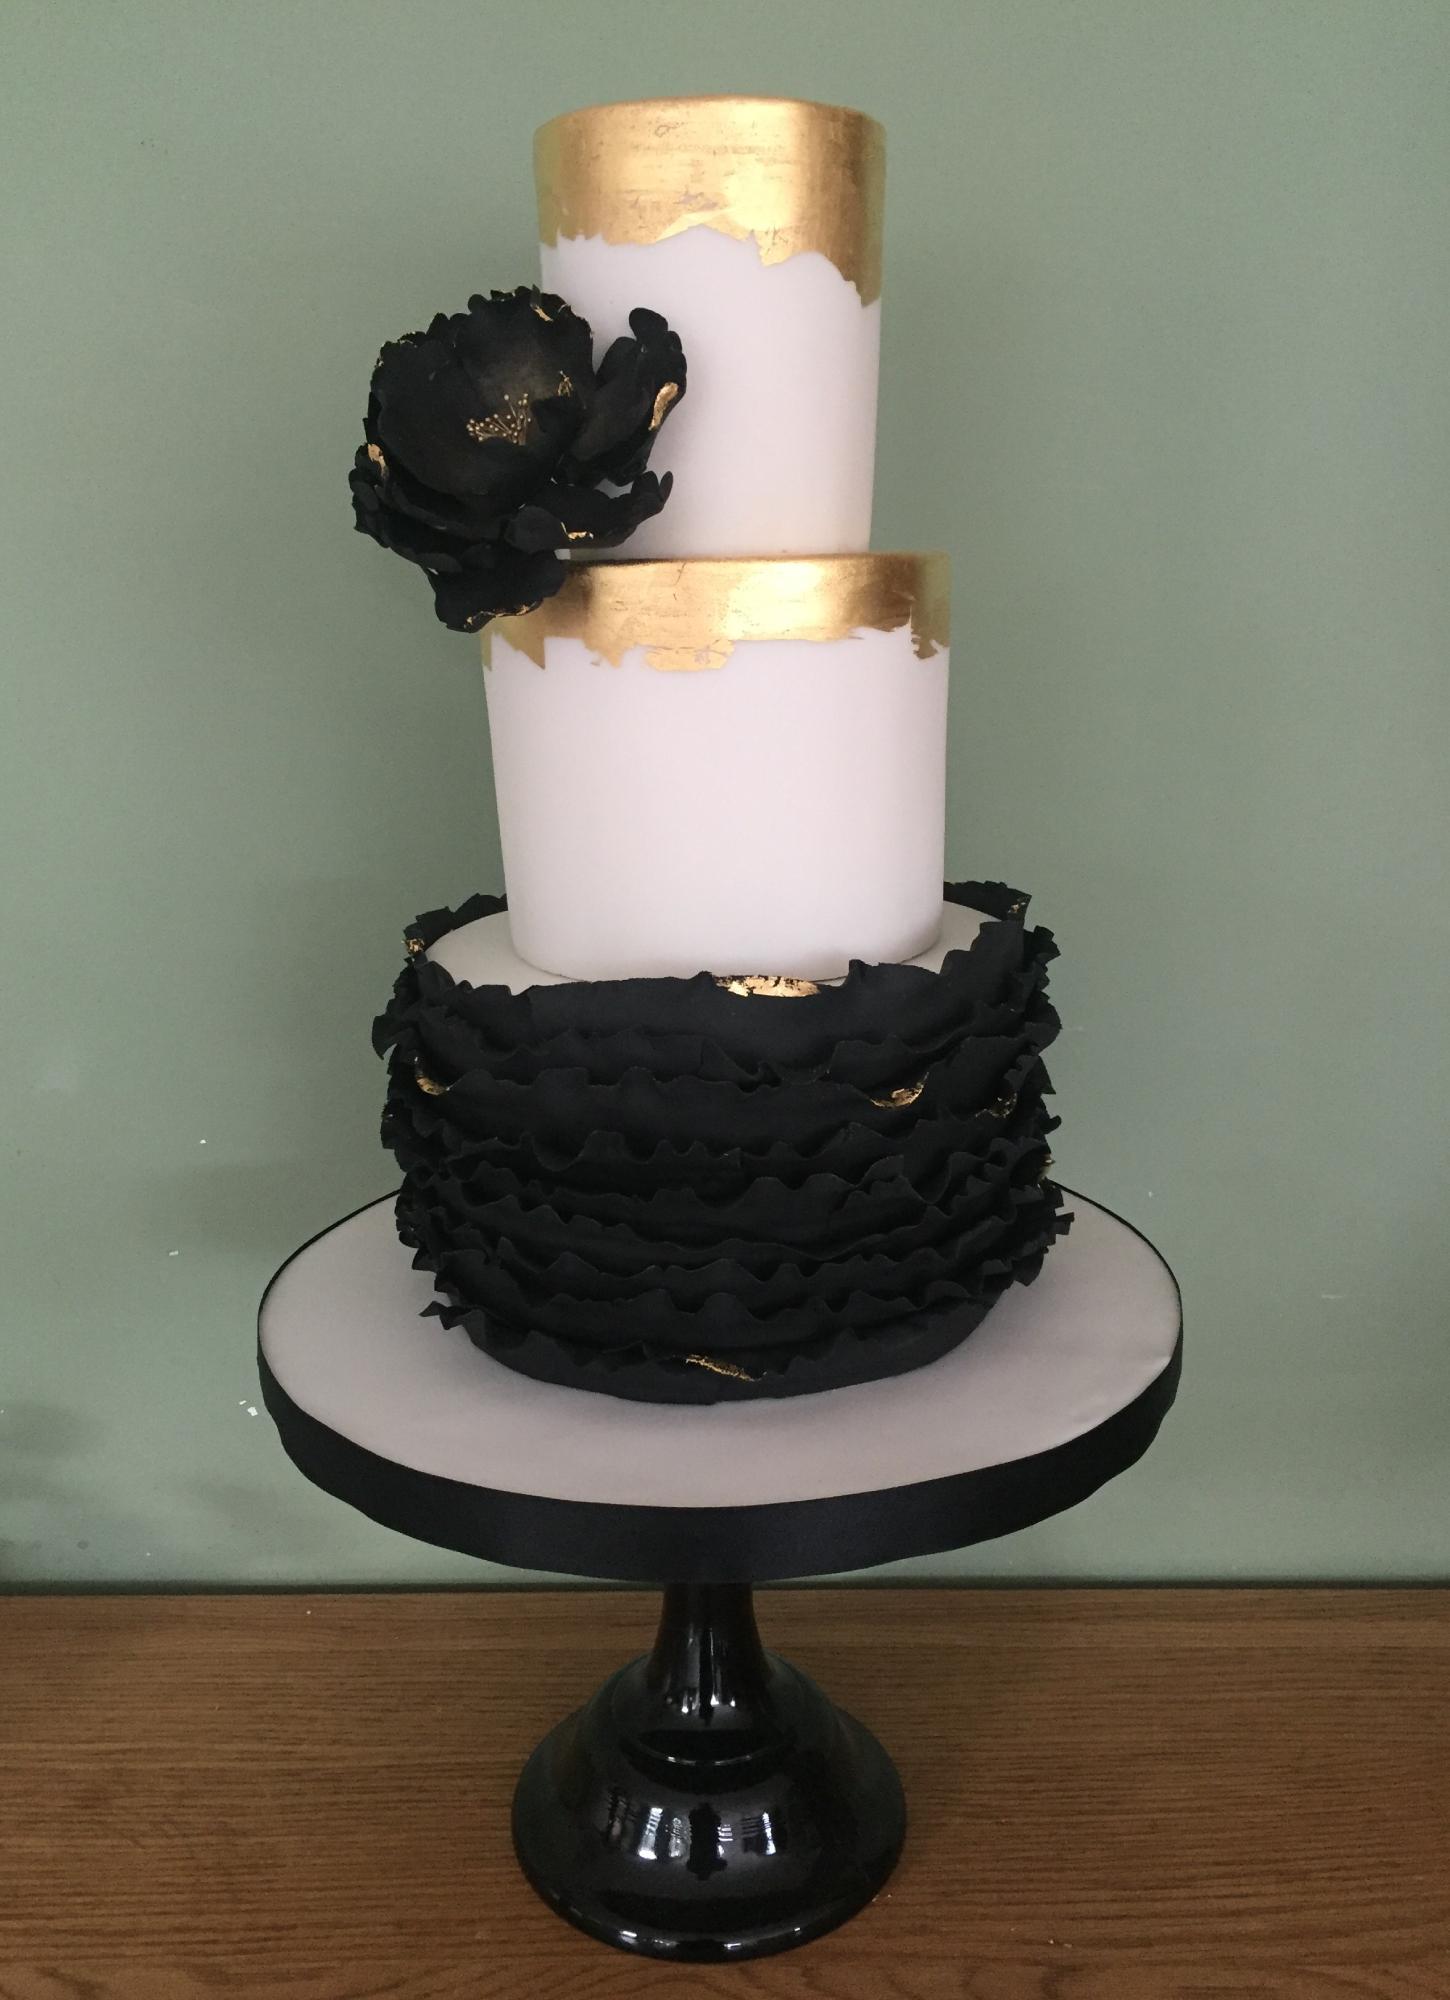 Bespoke Birthday Cake - Pat a Cakes Jersey